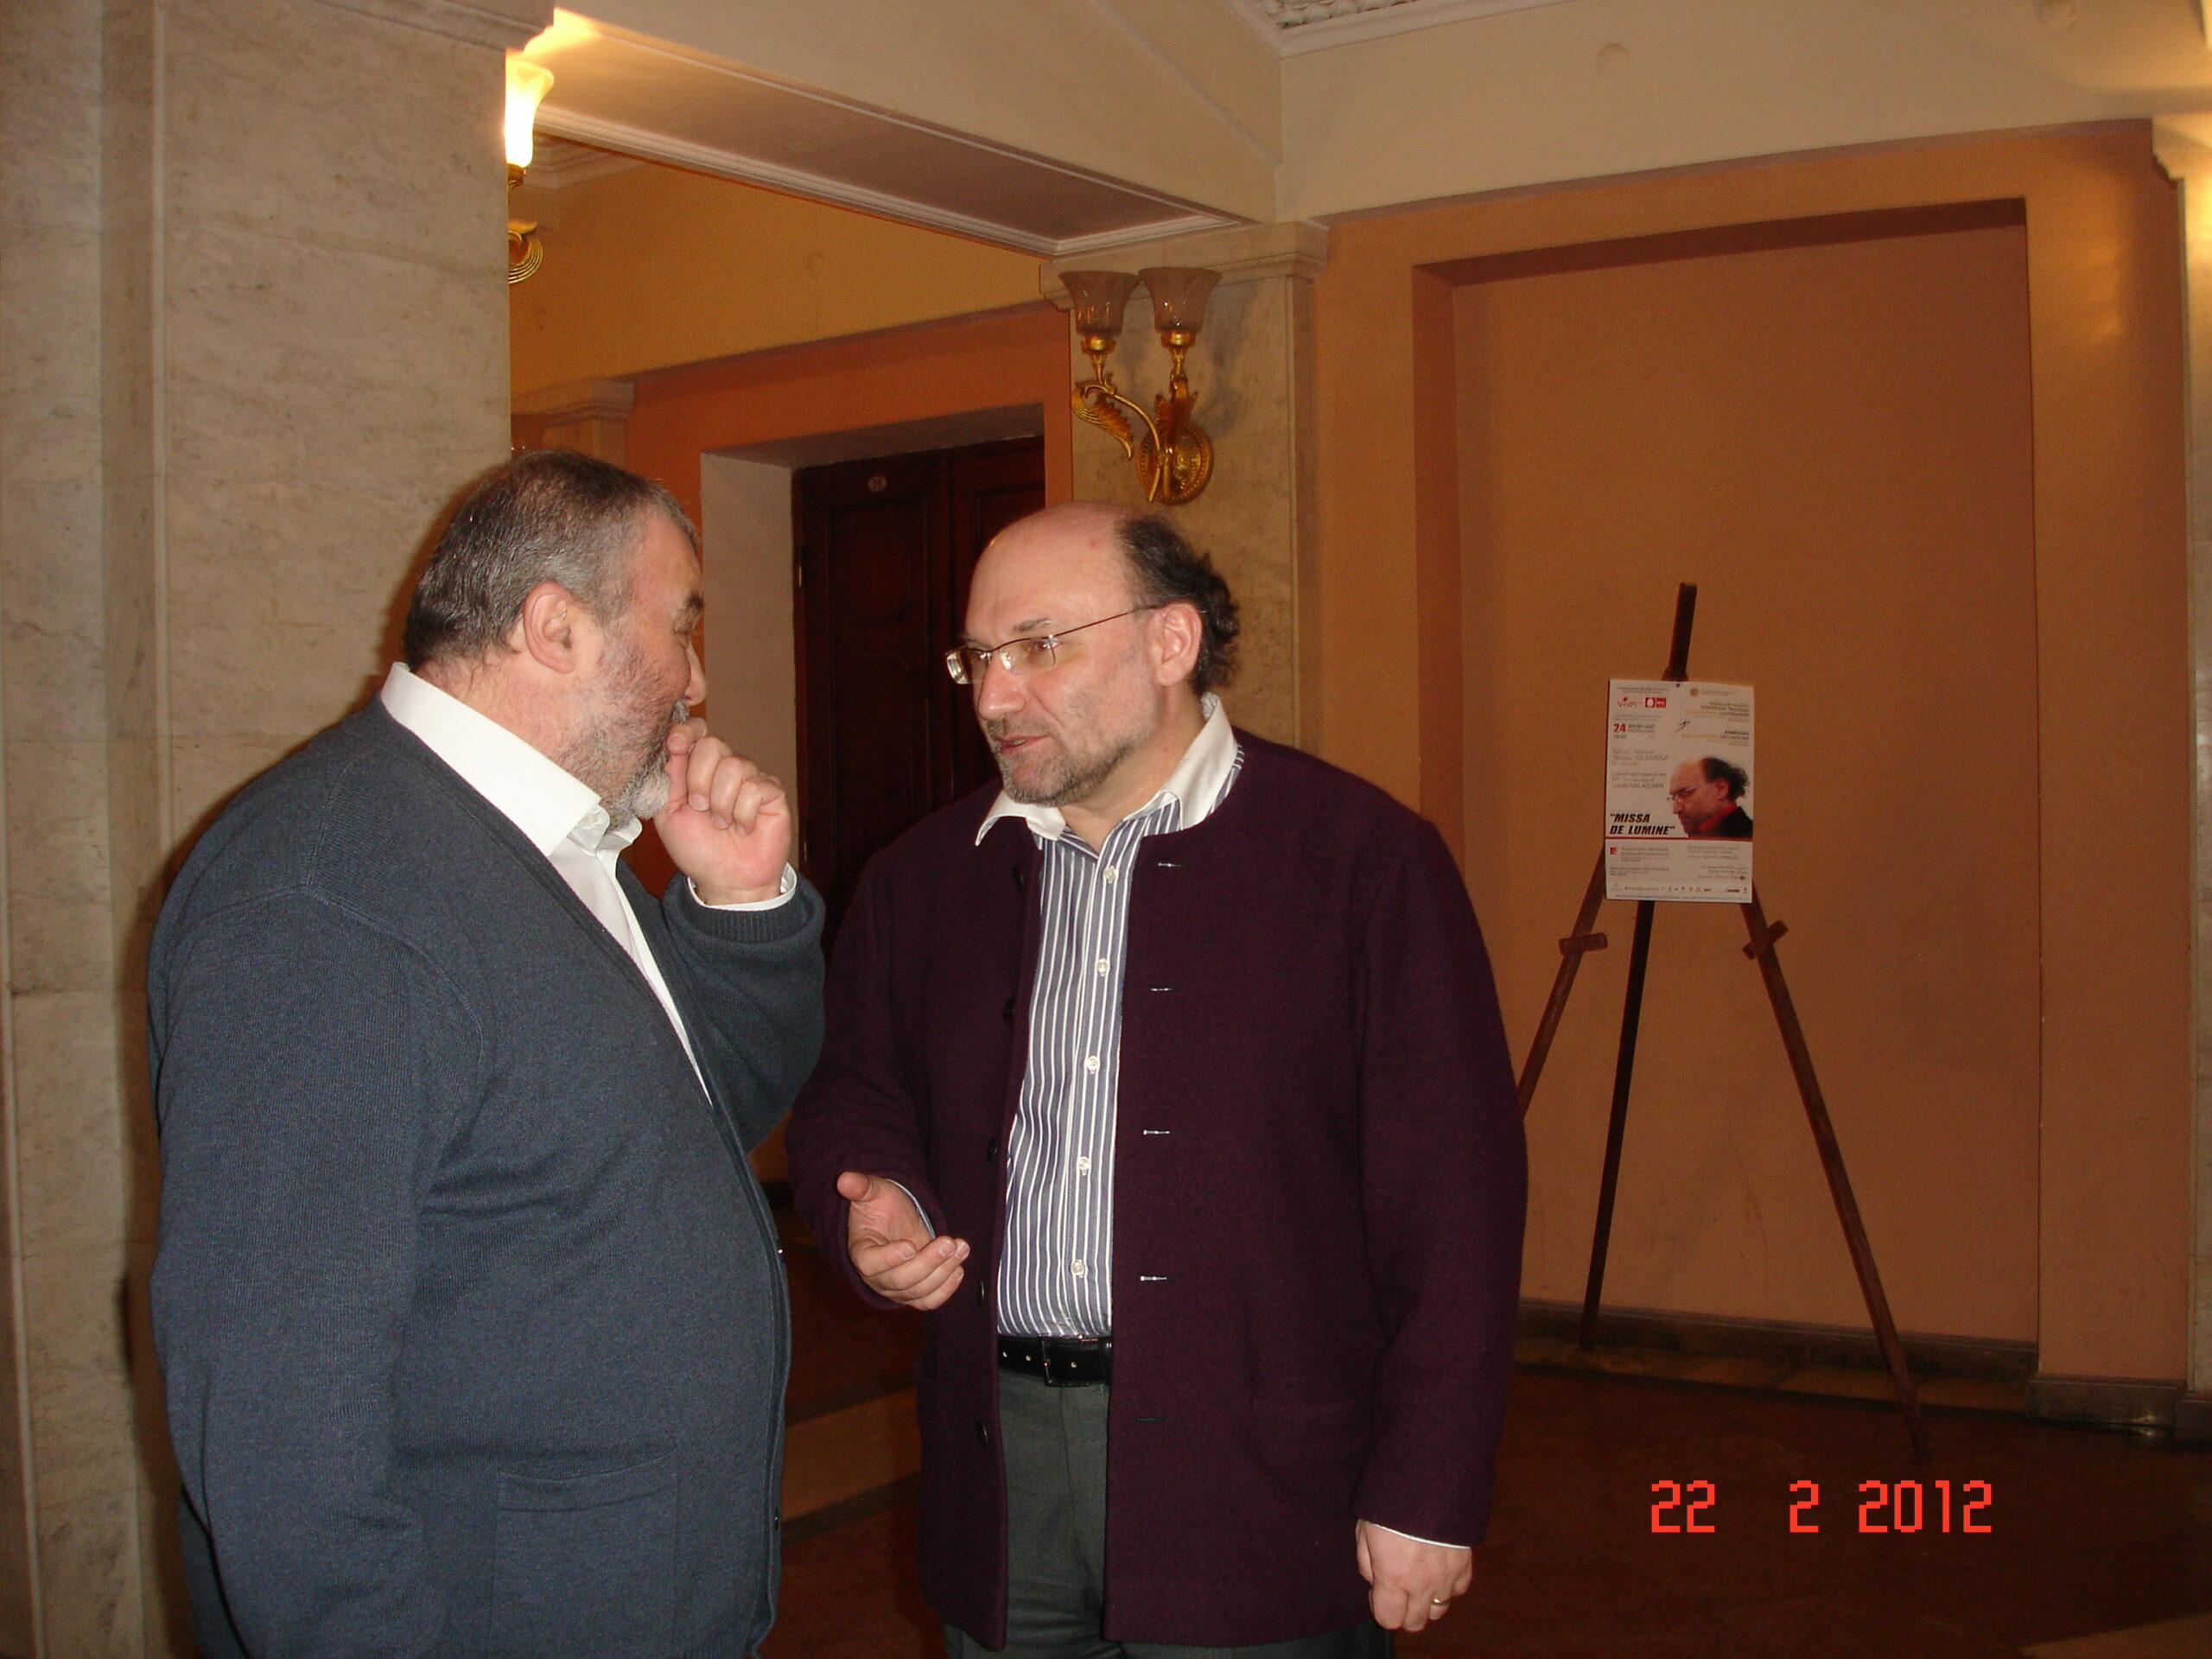 With Robert Mlkeyan